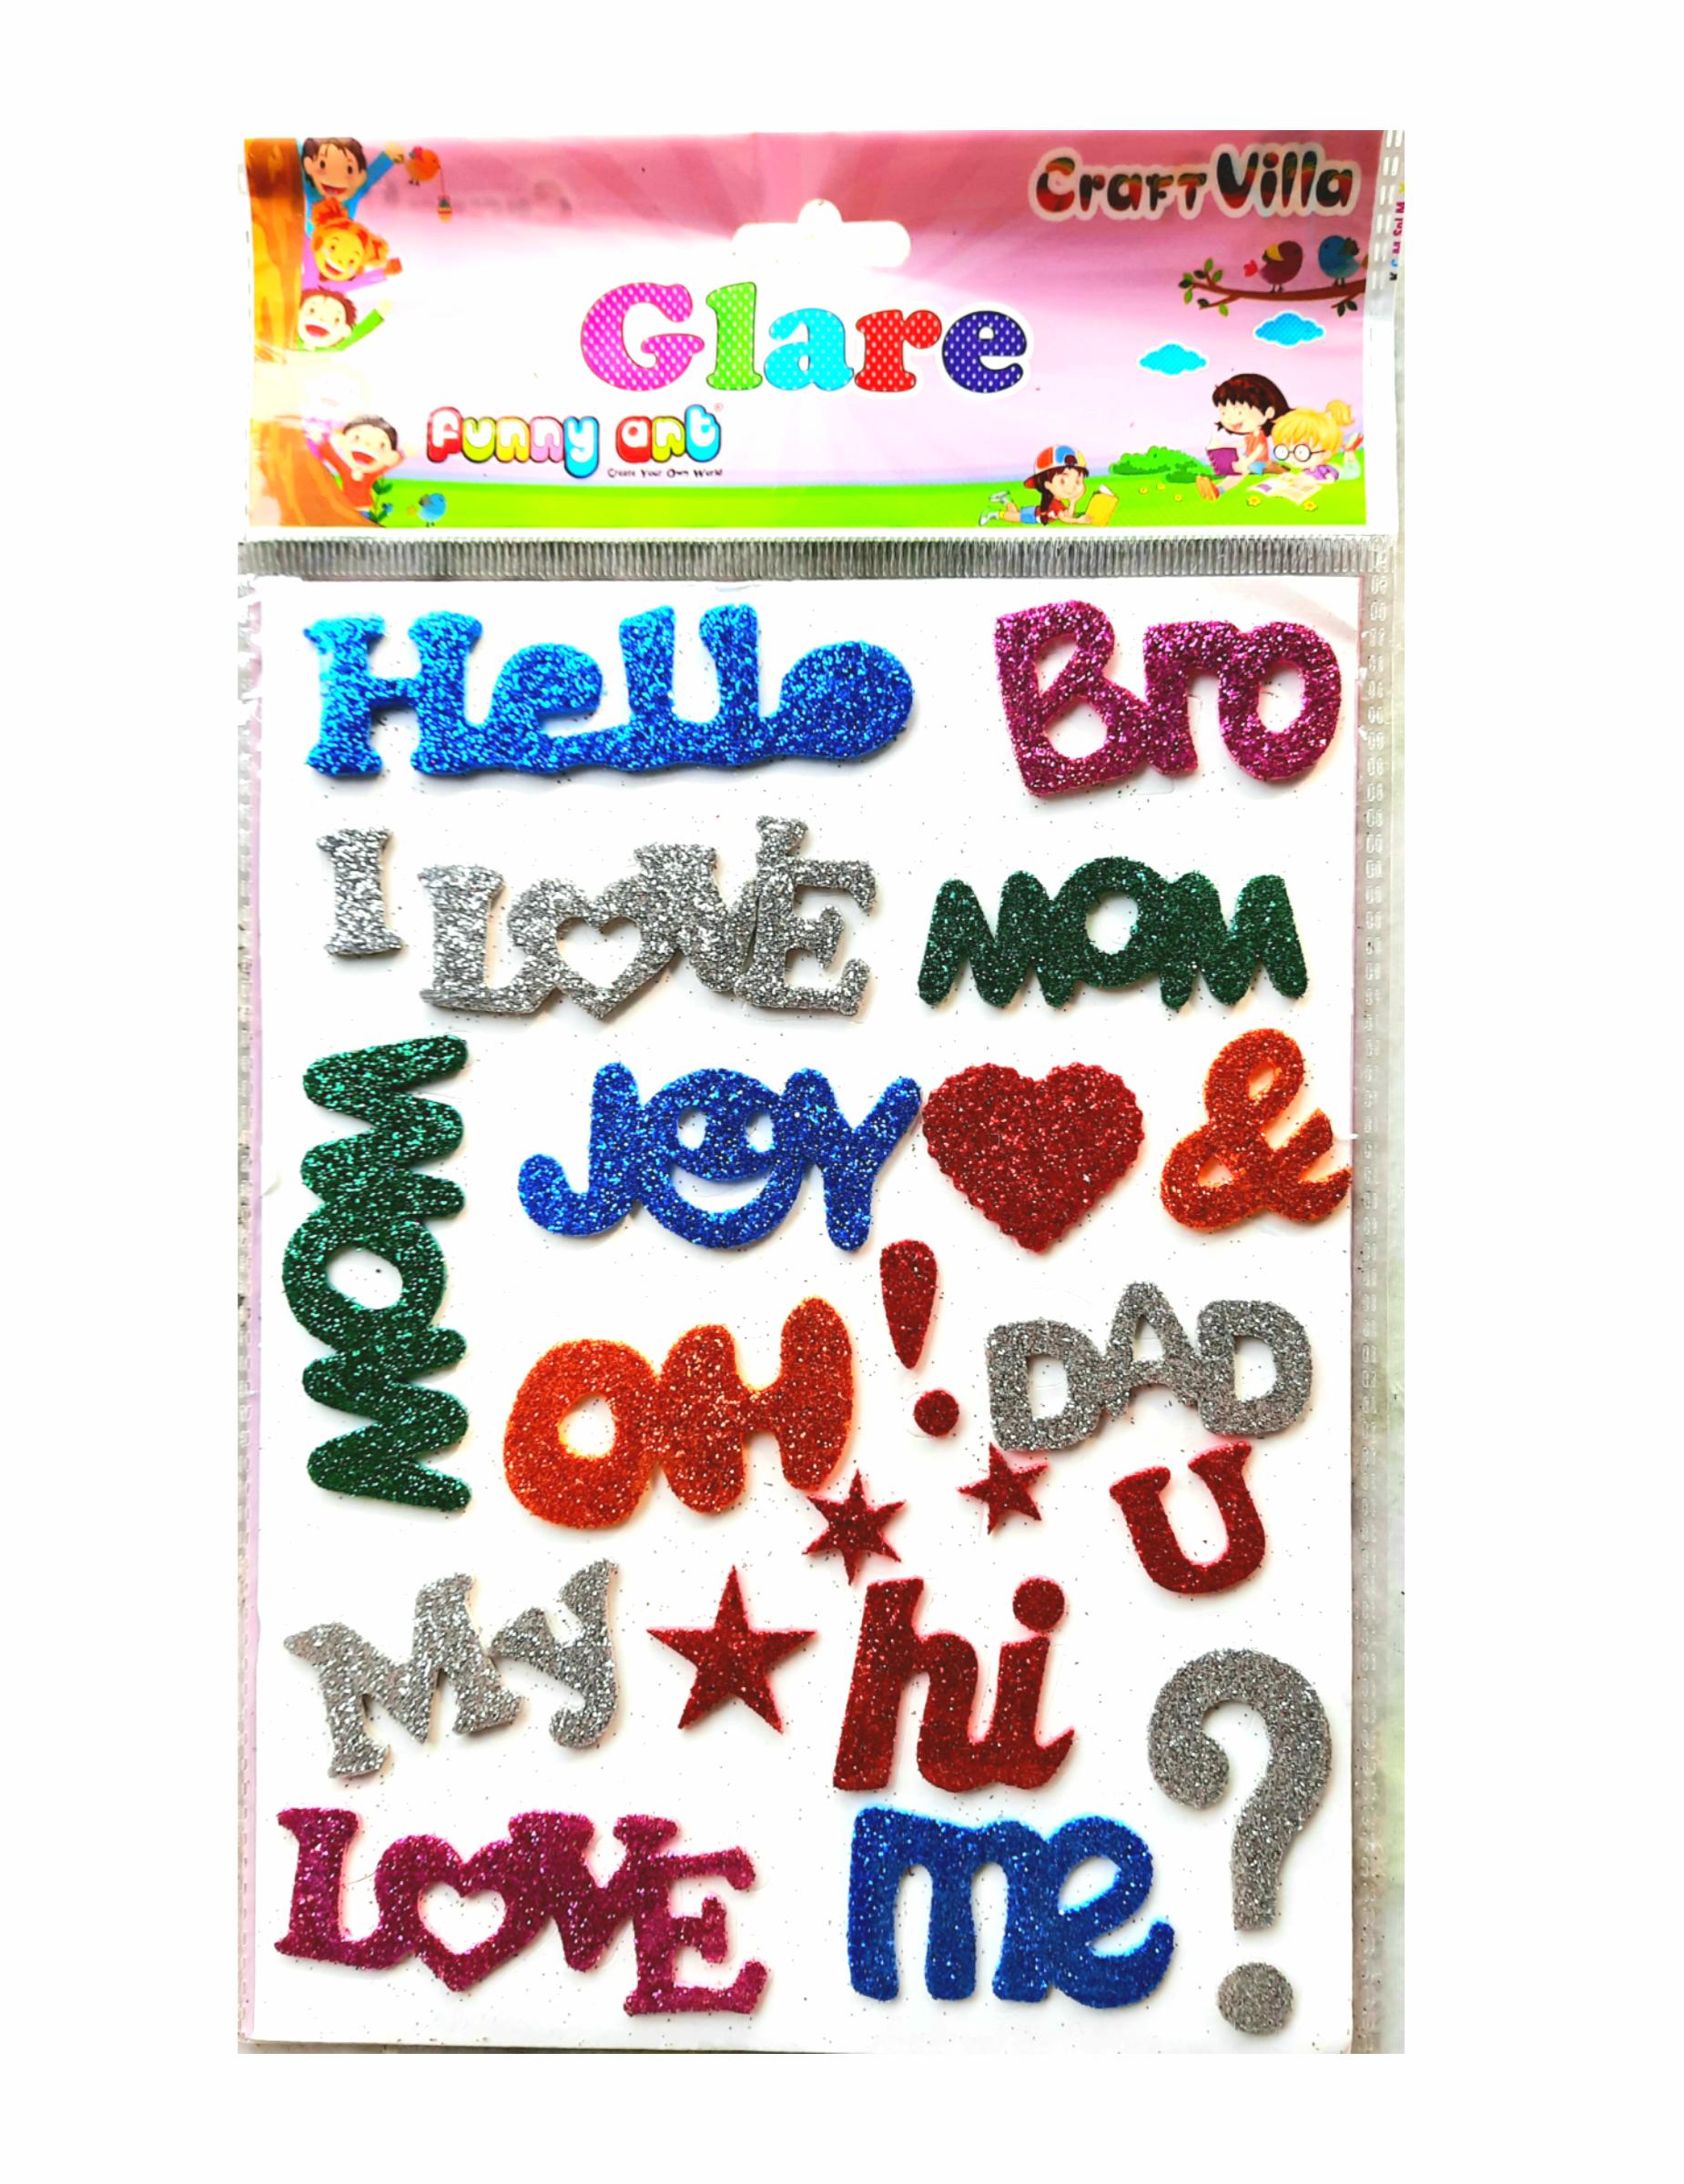 Craft Villa Glare Sparkle Glitter Self Adhesive (Multi Color) Eva Foam Sticker (Greeting Word Shape) Stickers for Craft , DIY, Scrapbooking and Decoration etc